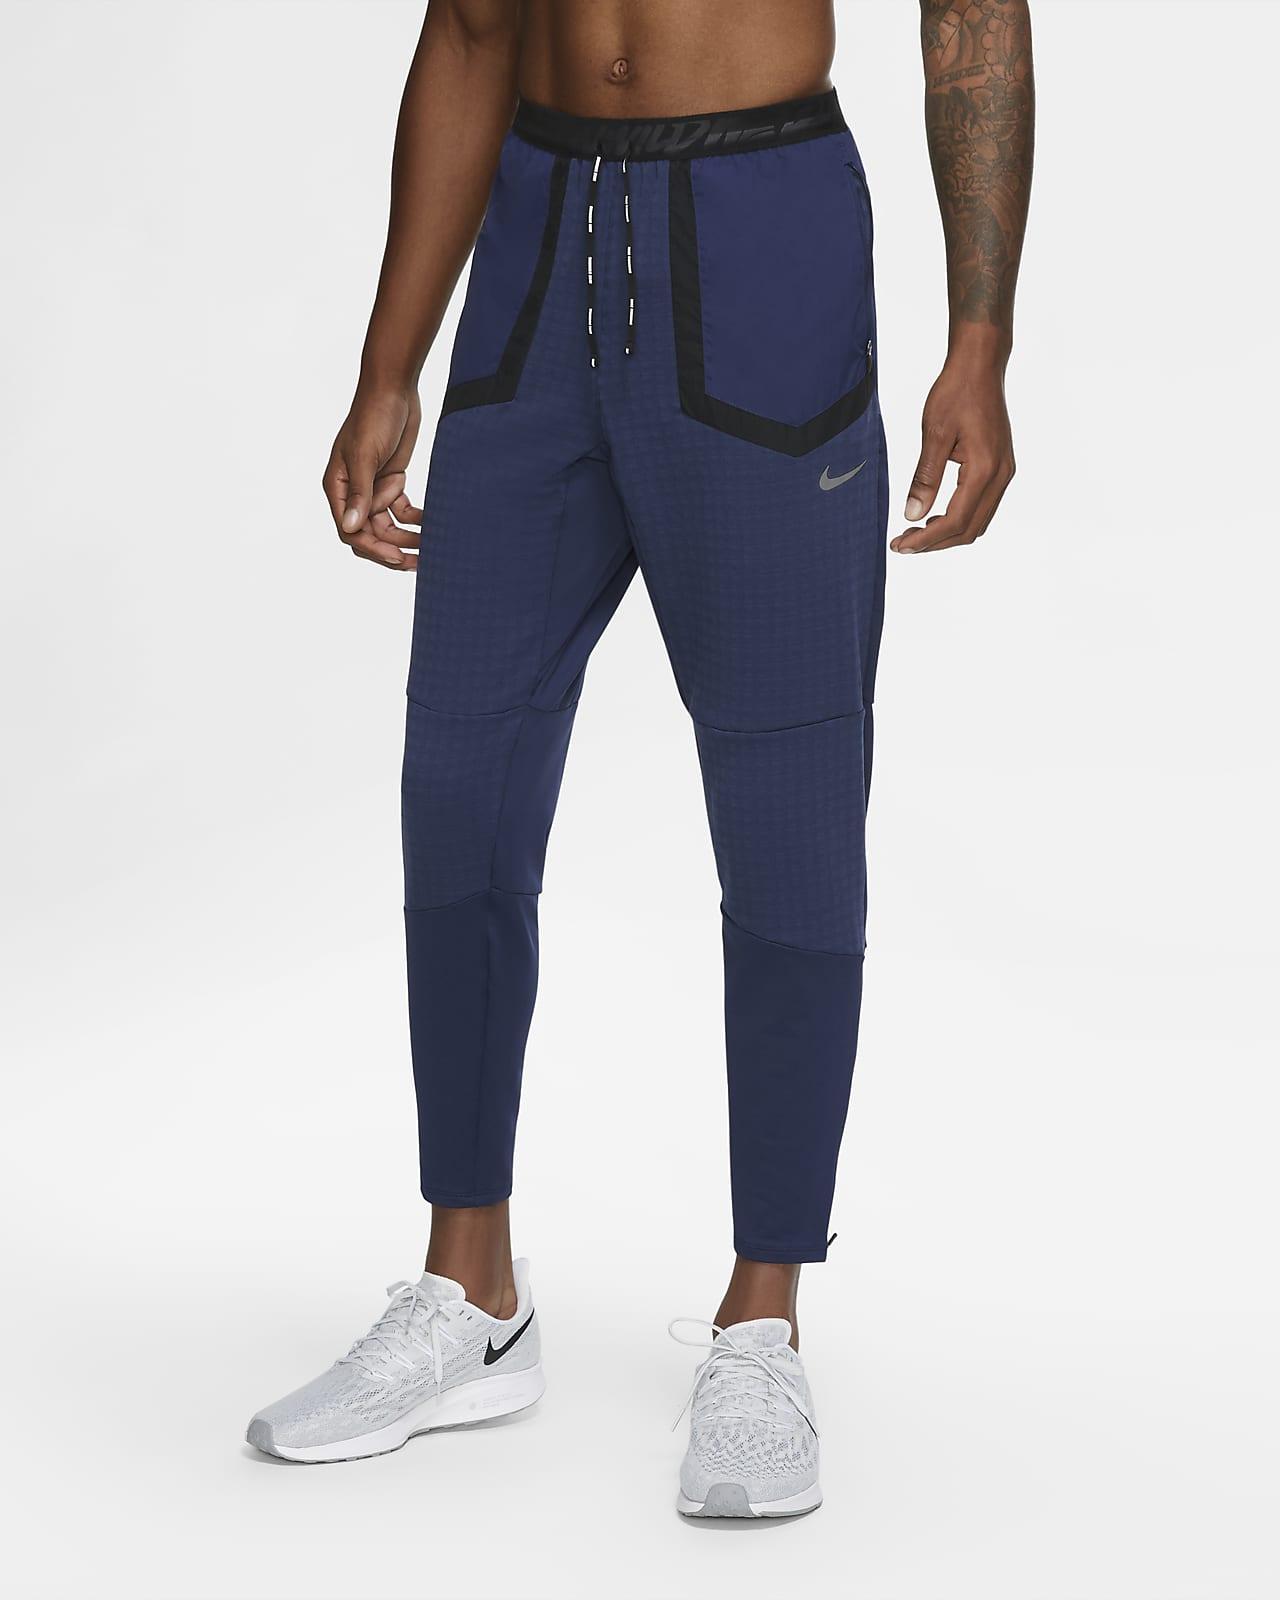 Pantalones de running para hombre Nike Phenom Elite Wild Run